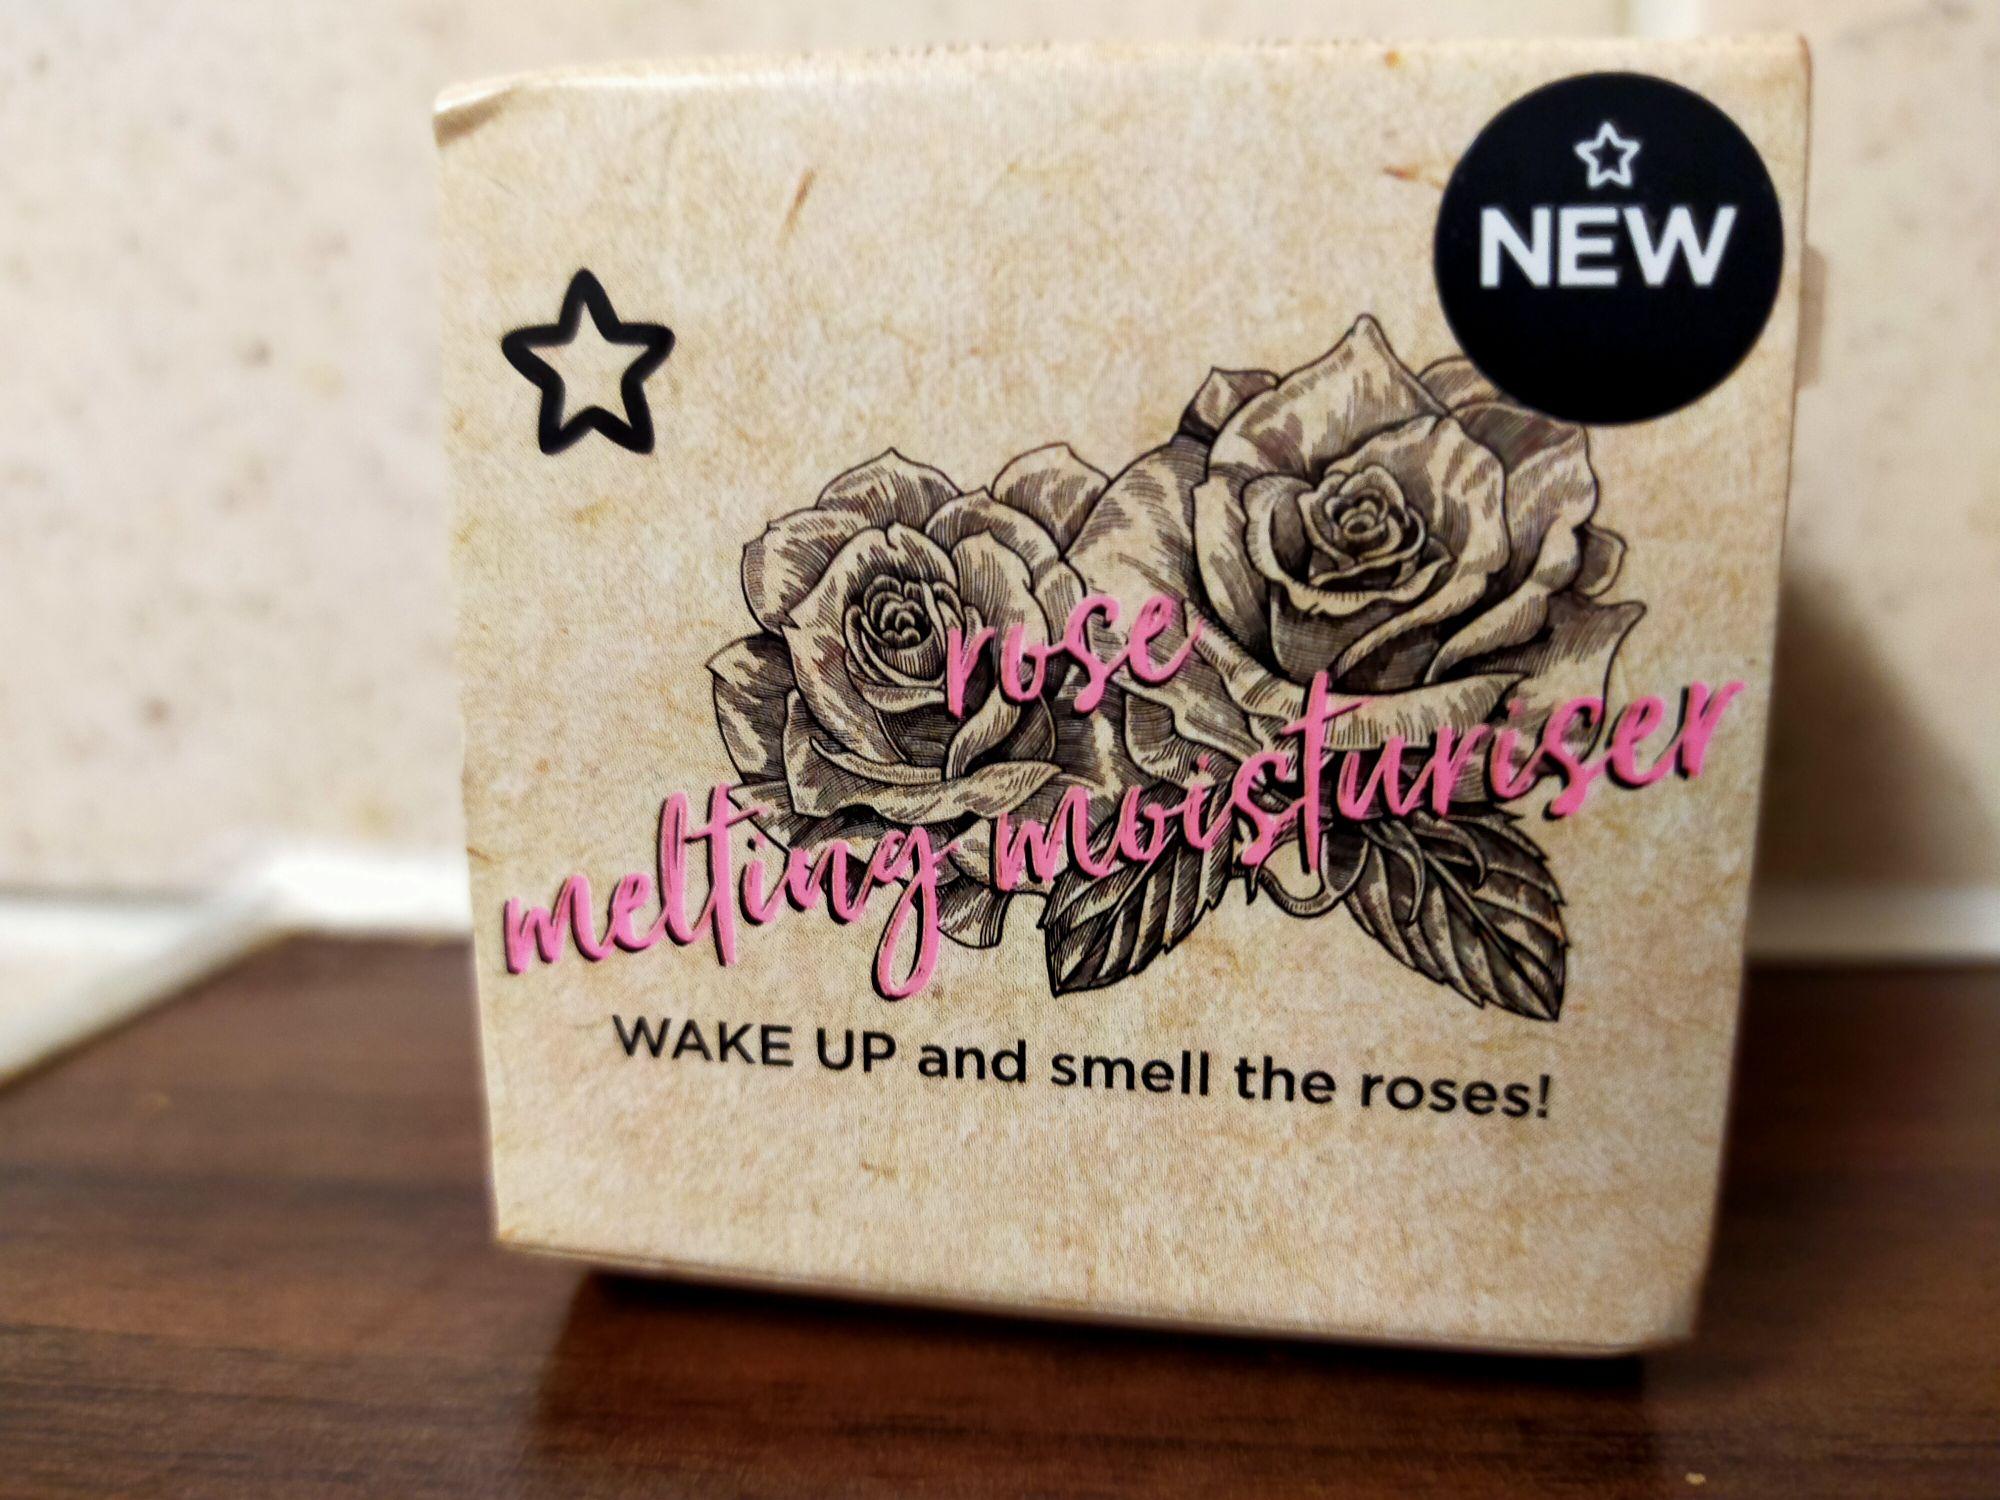 Rose melting moisturizer 50p for 2 @ Superdrug (Birchwood)